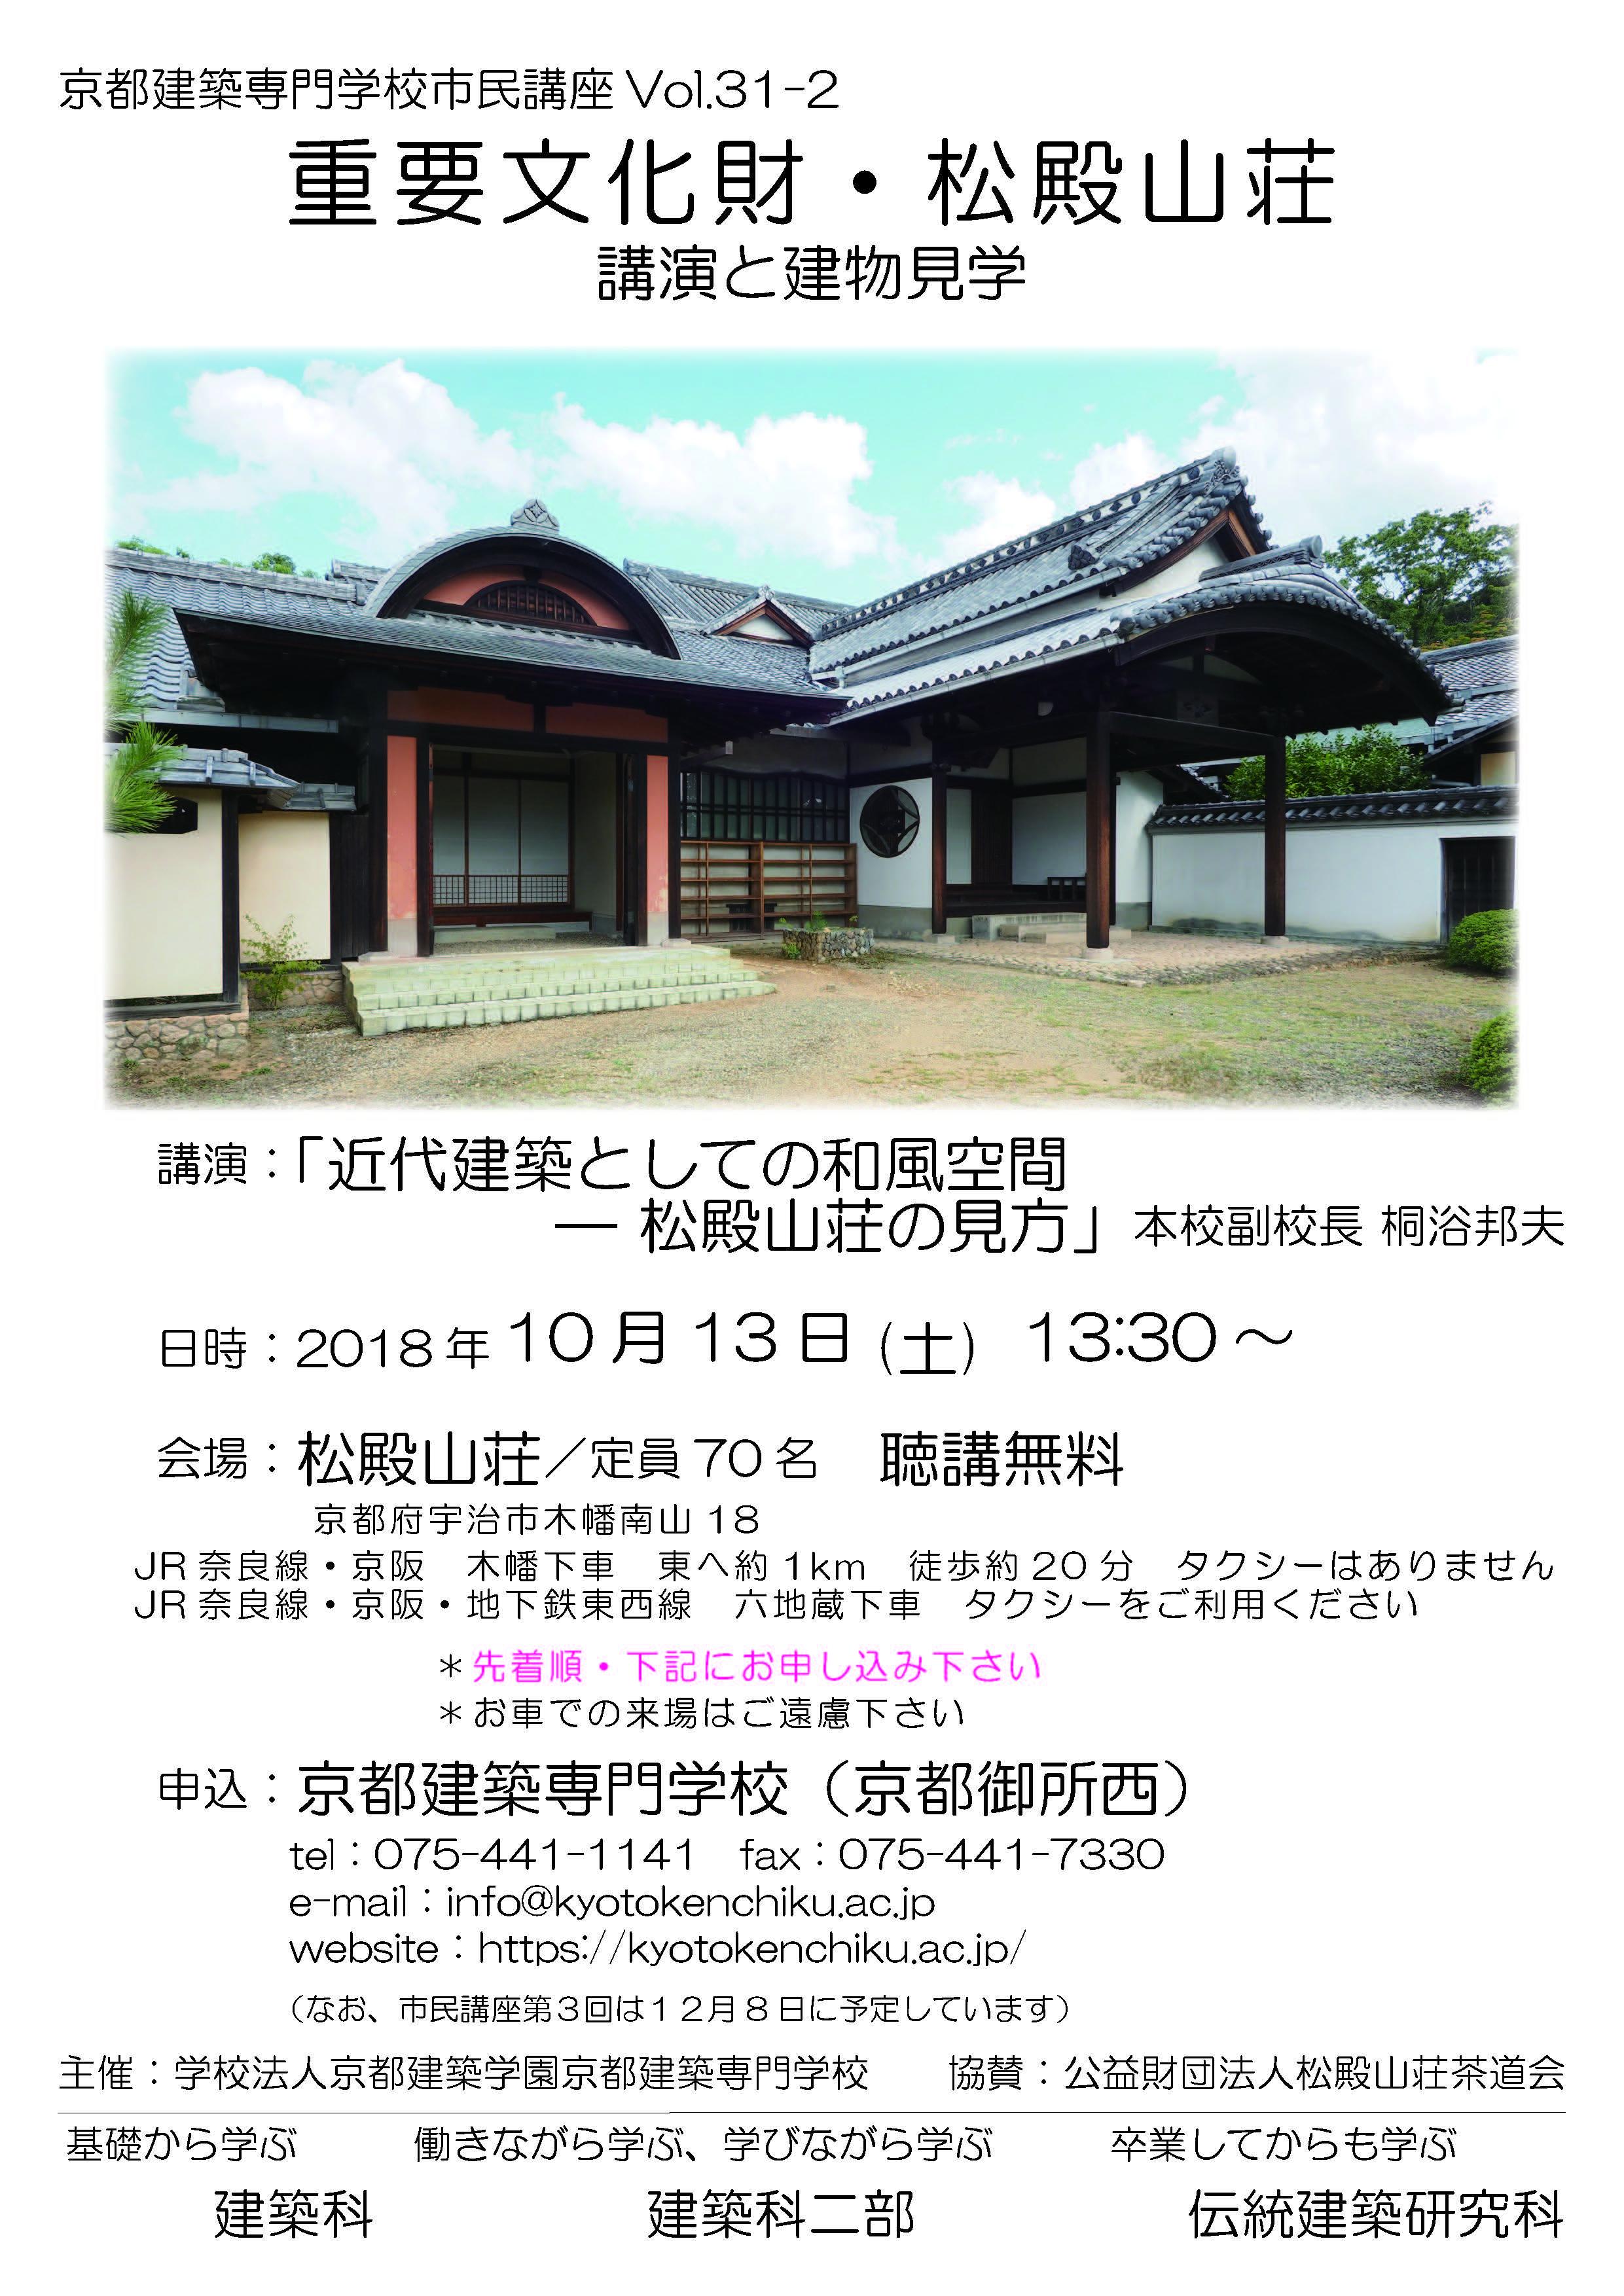 https://kyotokenchiku.ac.jp/wp-content/uploads/2018/08/657ed4381fa5ffb772e0fdb836b837f5.jpg